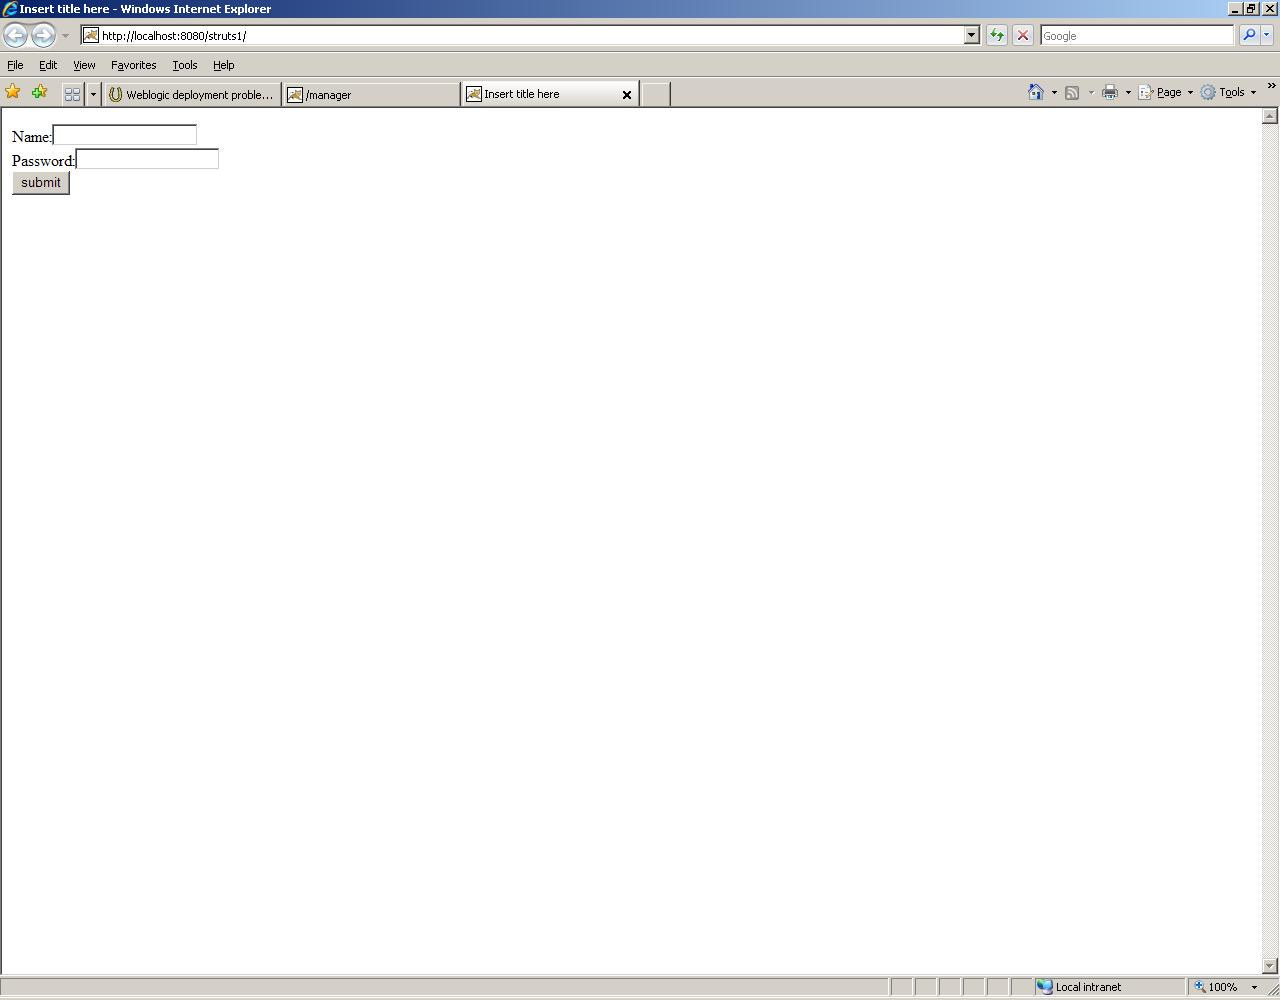 Weblogic deployment problem (BEA/Weblogic forum at Coderanch)